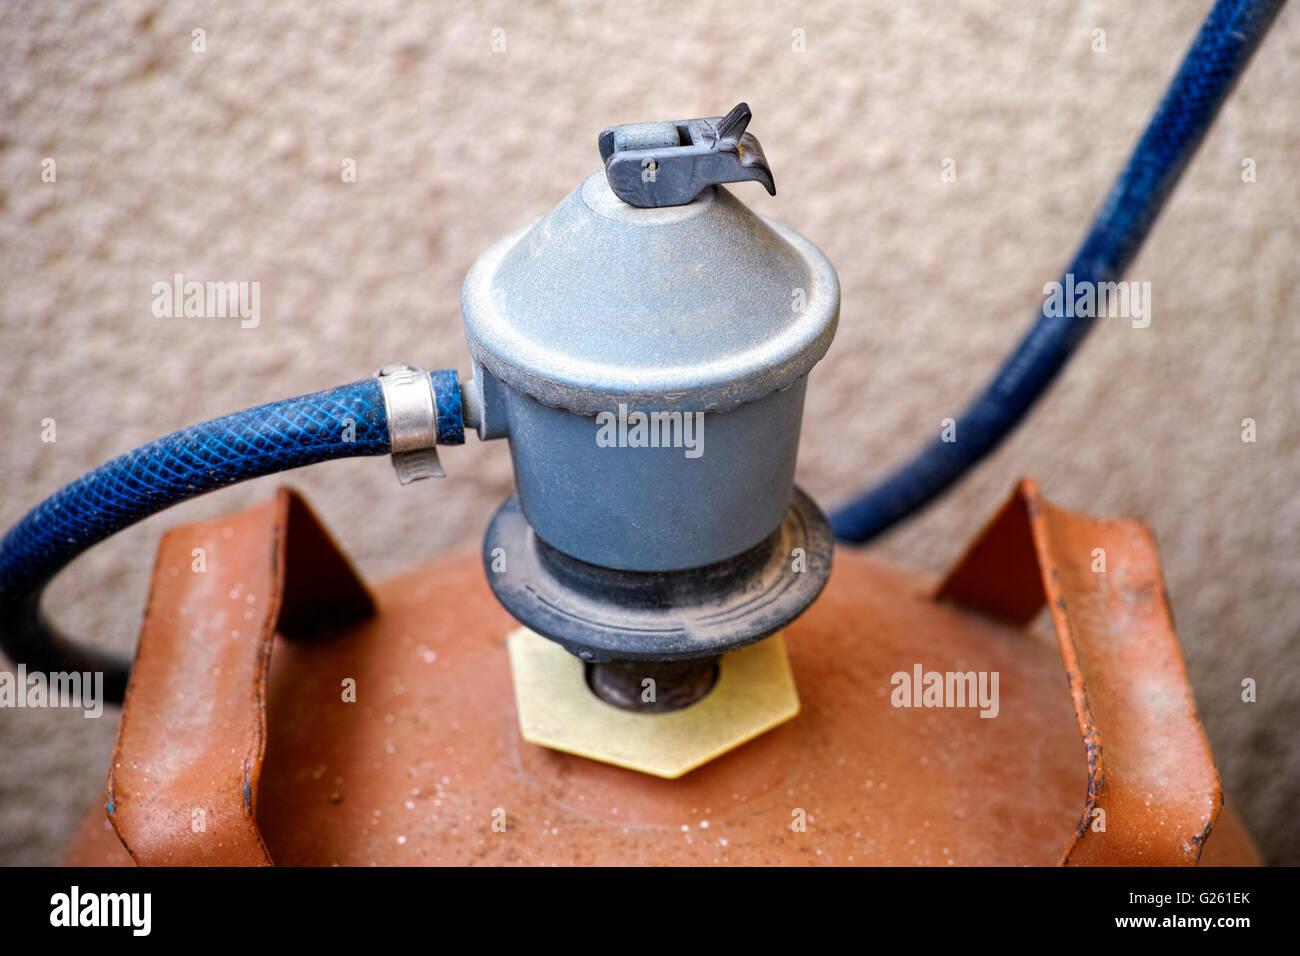 Gas regulator switch on orange gas bottle. - Stock Image